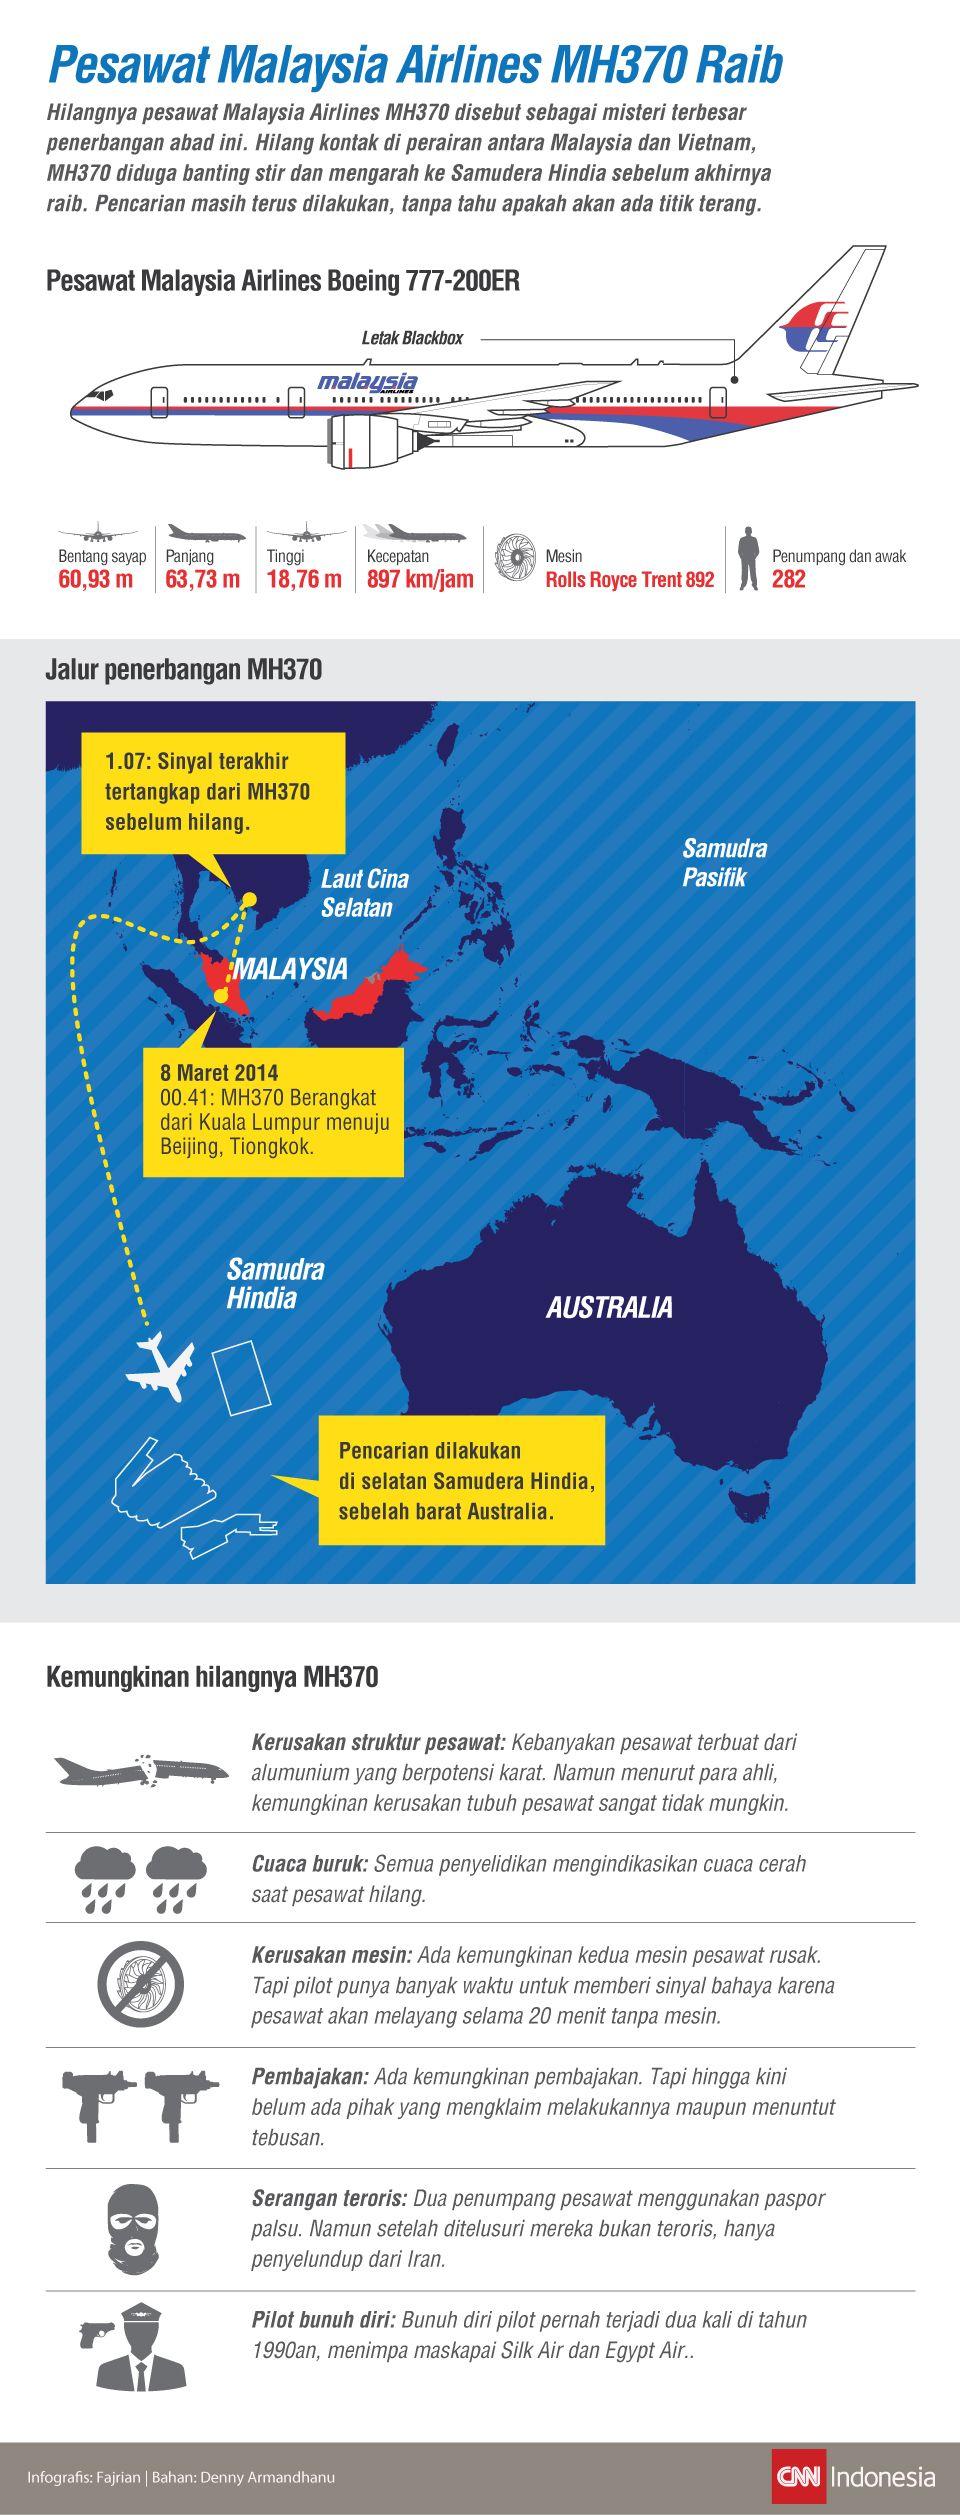 Infografis Malaysia Airlines MH370 Raib